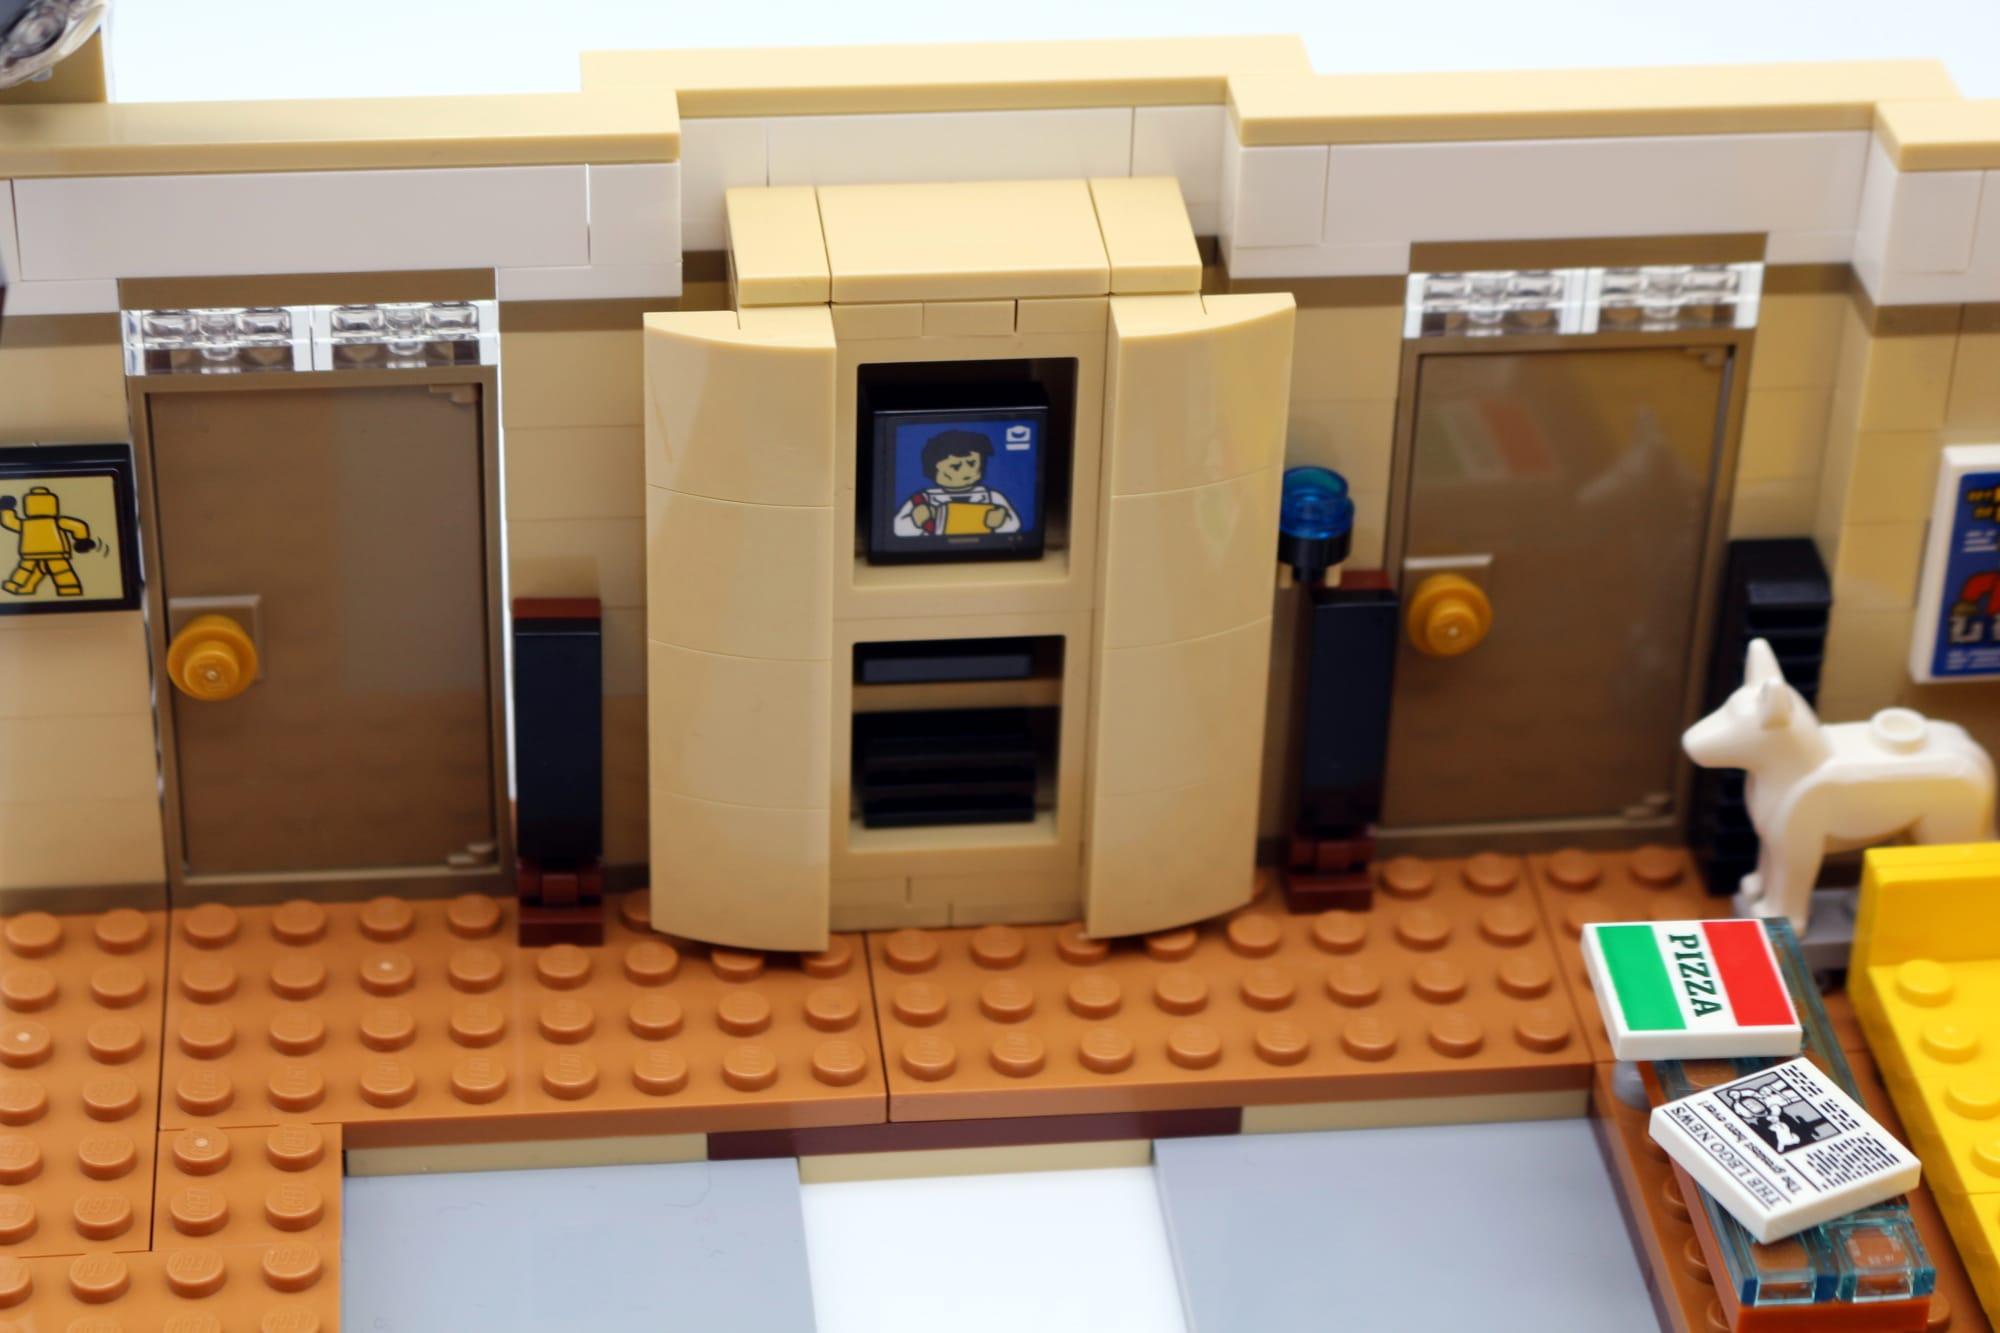 LEGO Friends 10292 The Friends Apartments 21